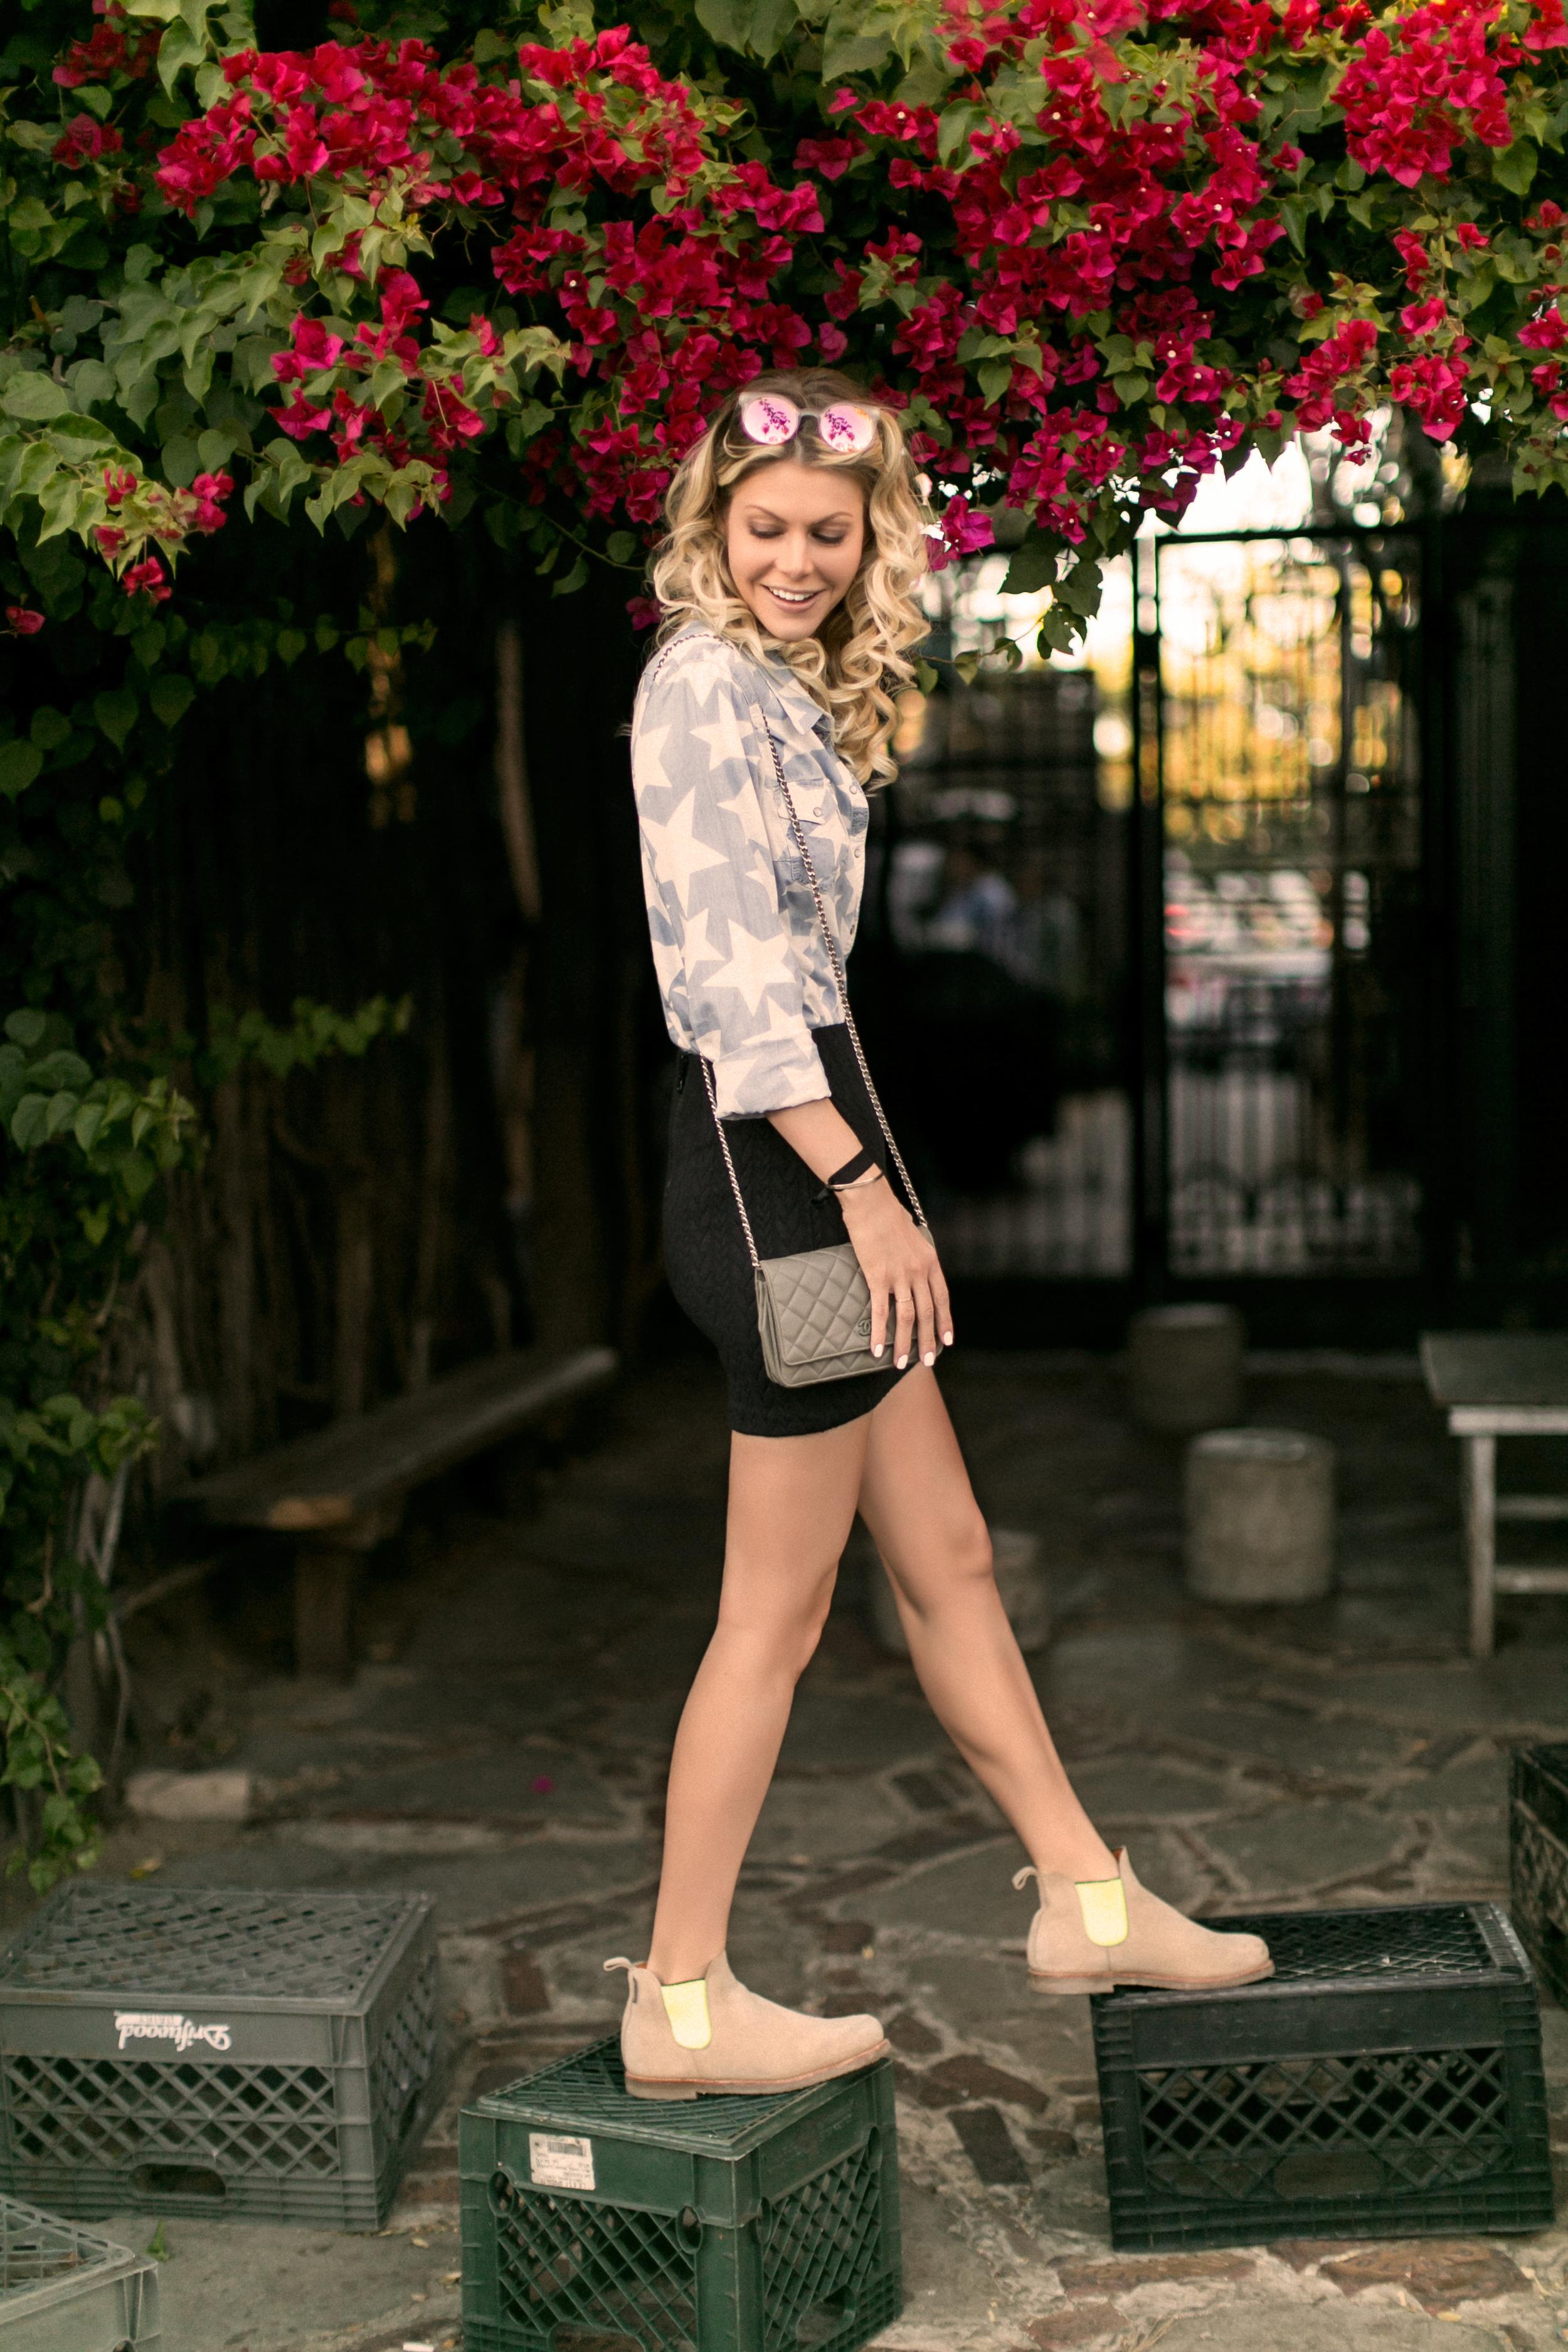 Kate Tikhomirova-11 17-0248.jpg